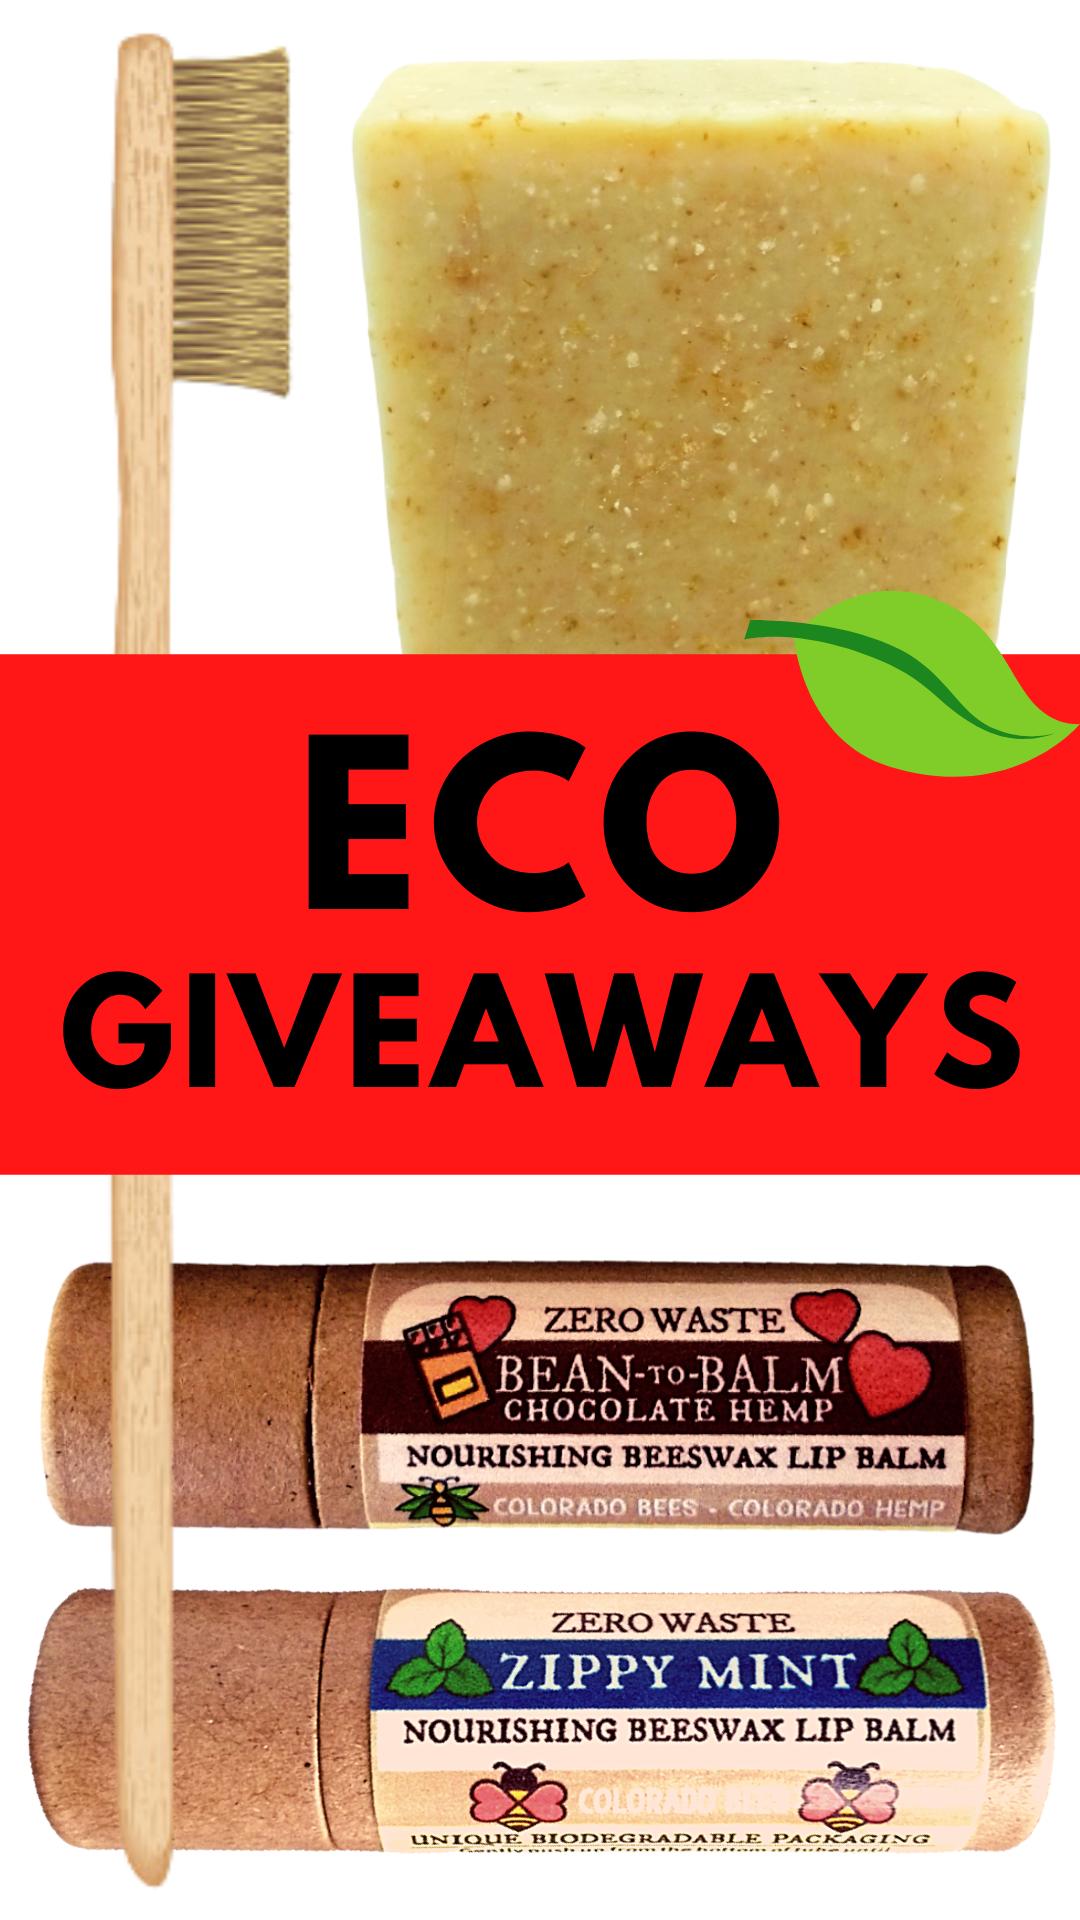 Free eco giveaways.